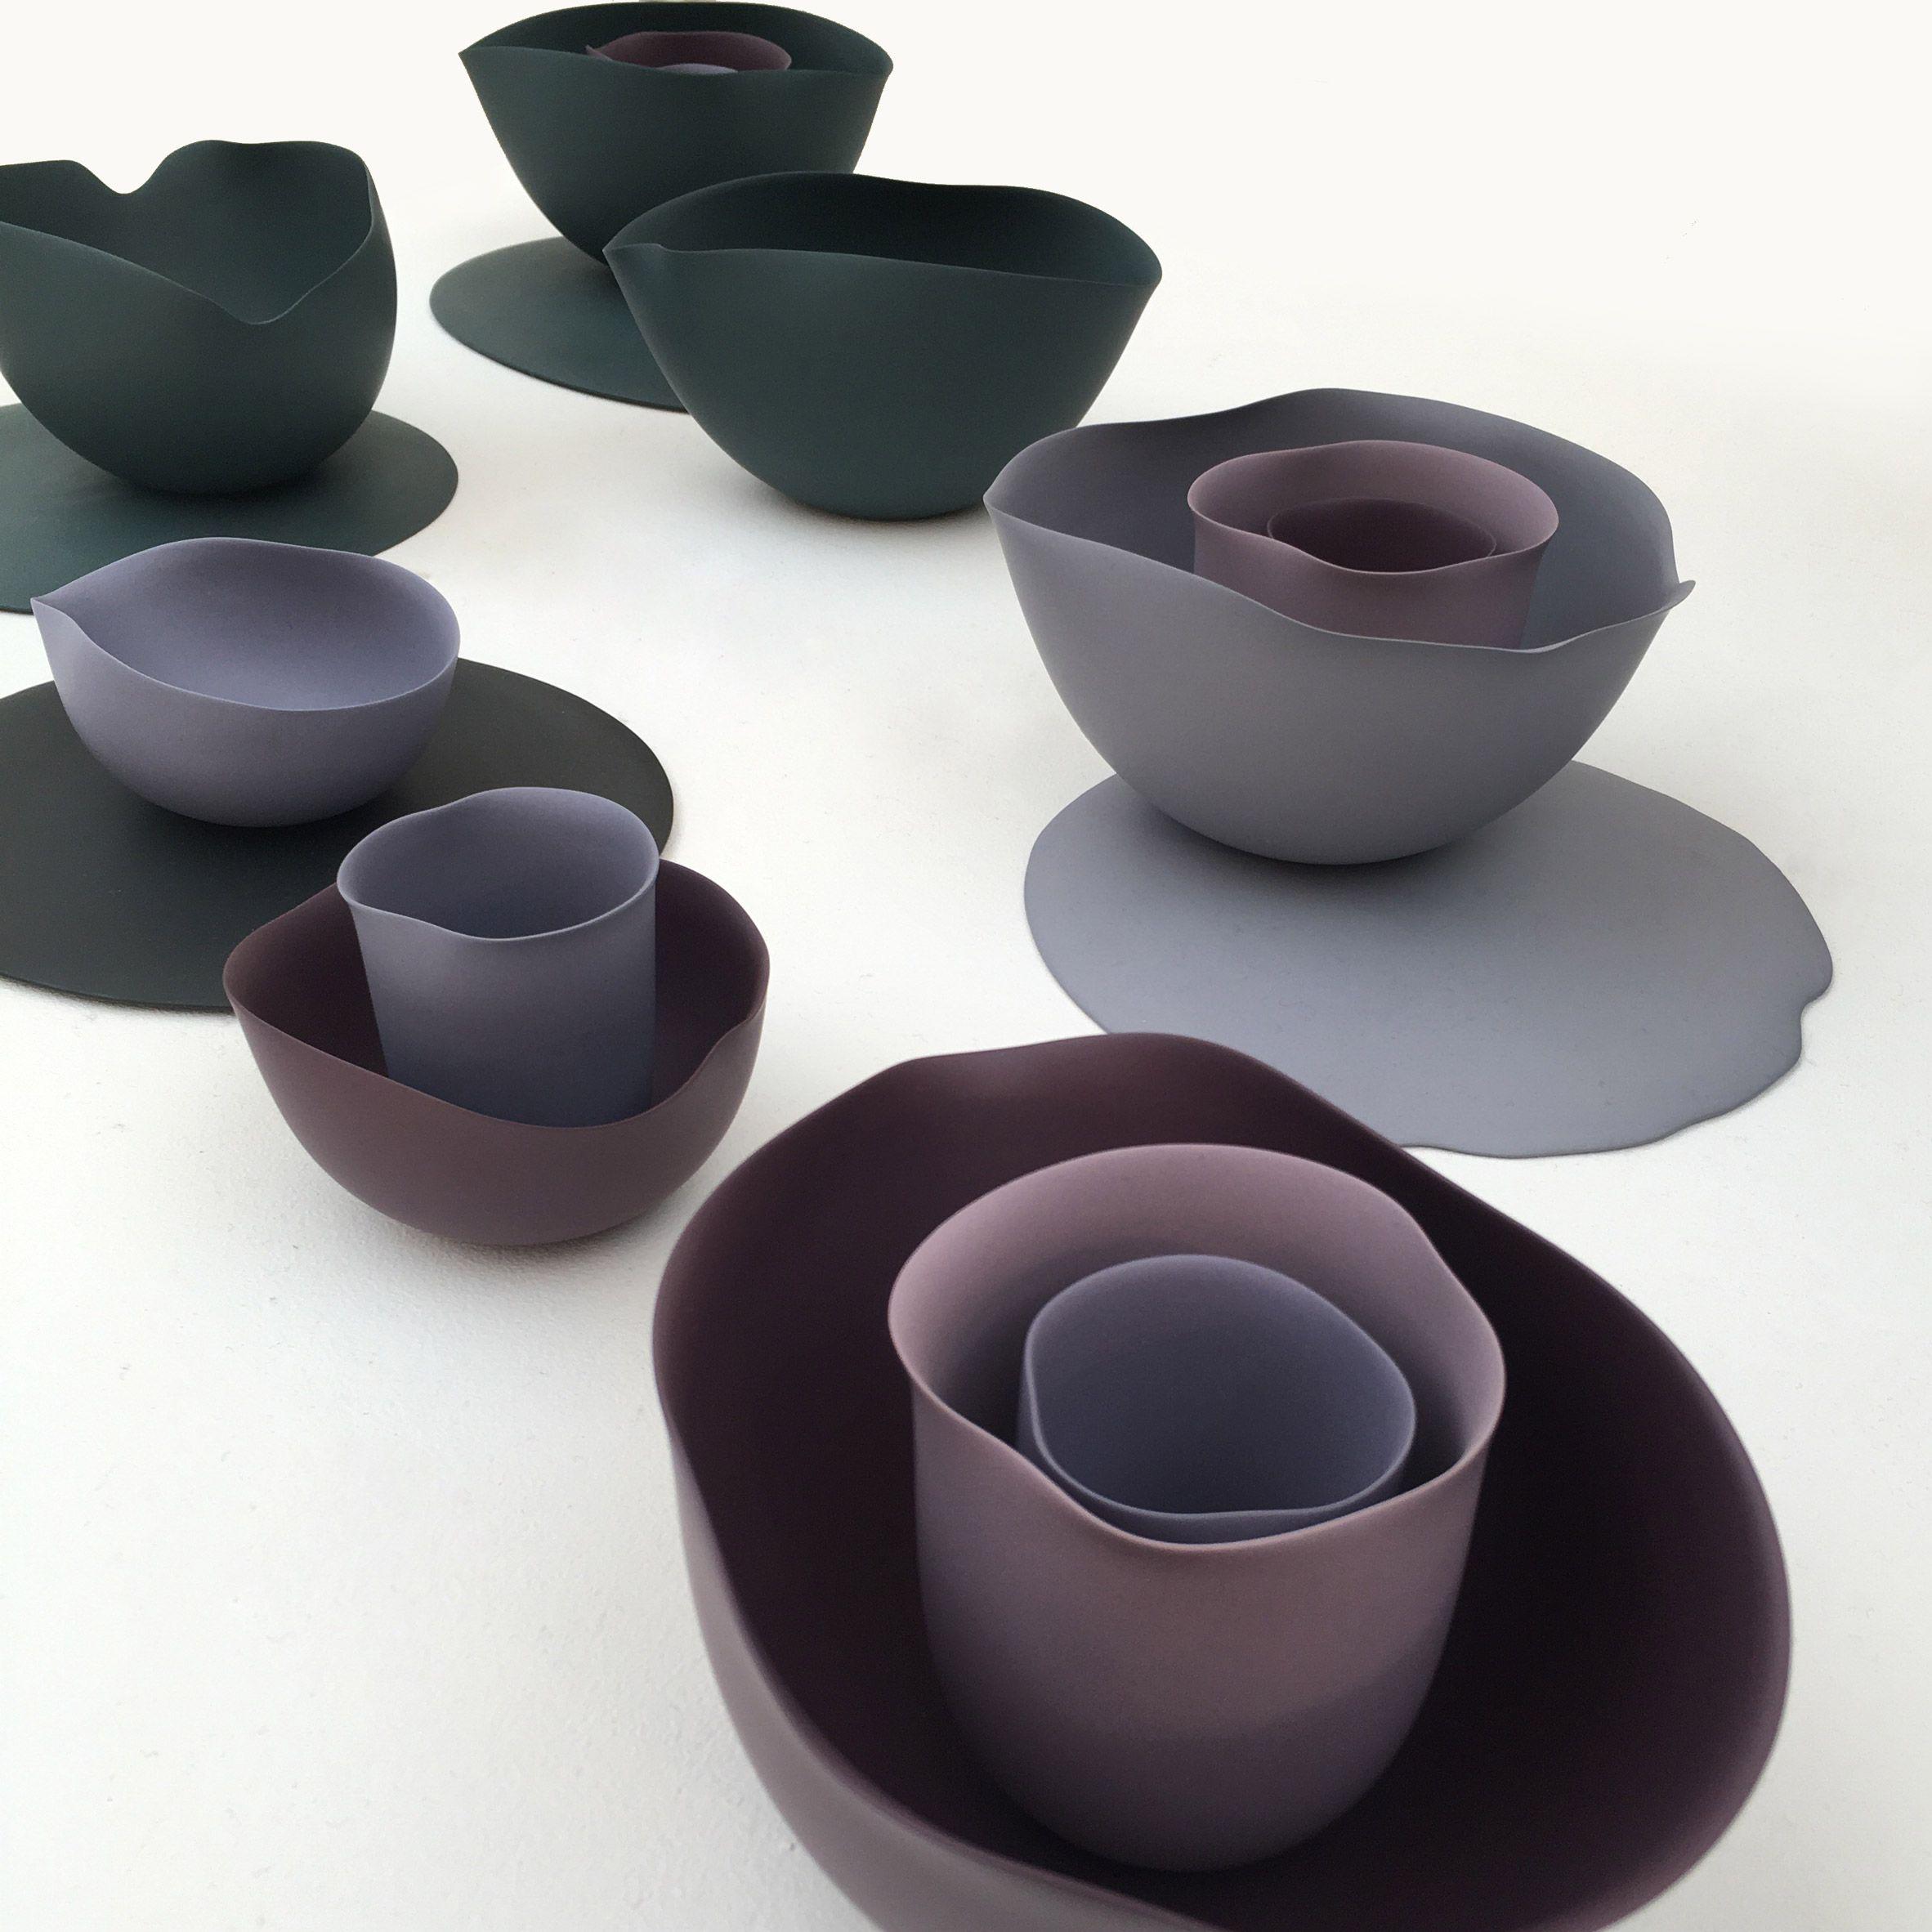 Seo Yeon Park Makes Porcelain Tableware Based On Georgia O Keeffe Paintings Porcelain Tableware Ceramic Tableware Tableware